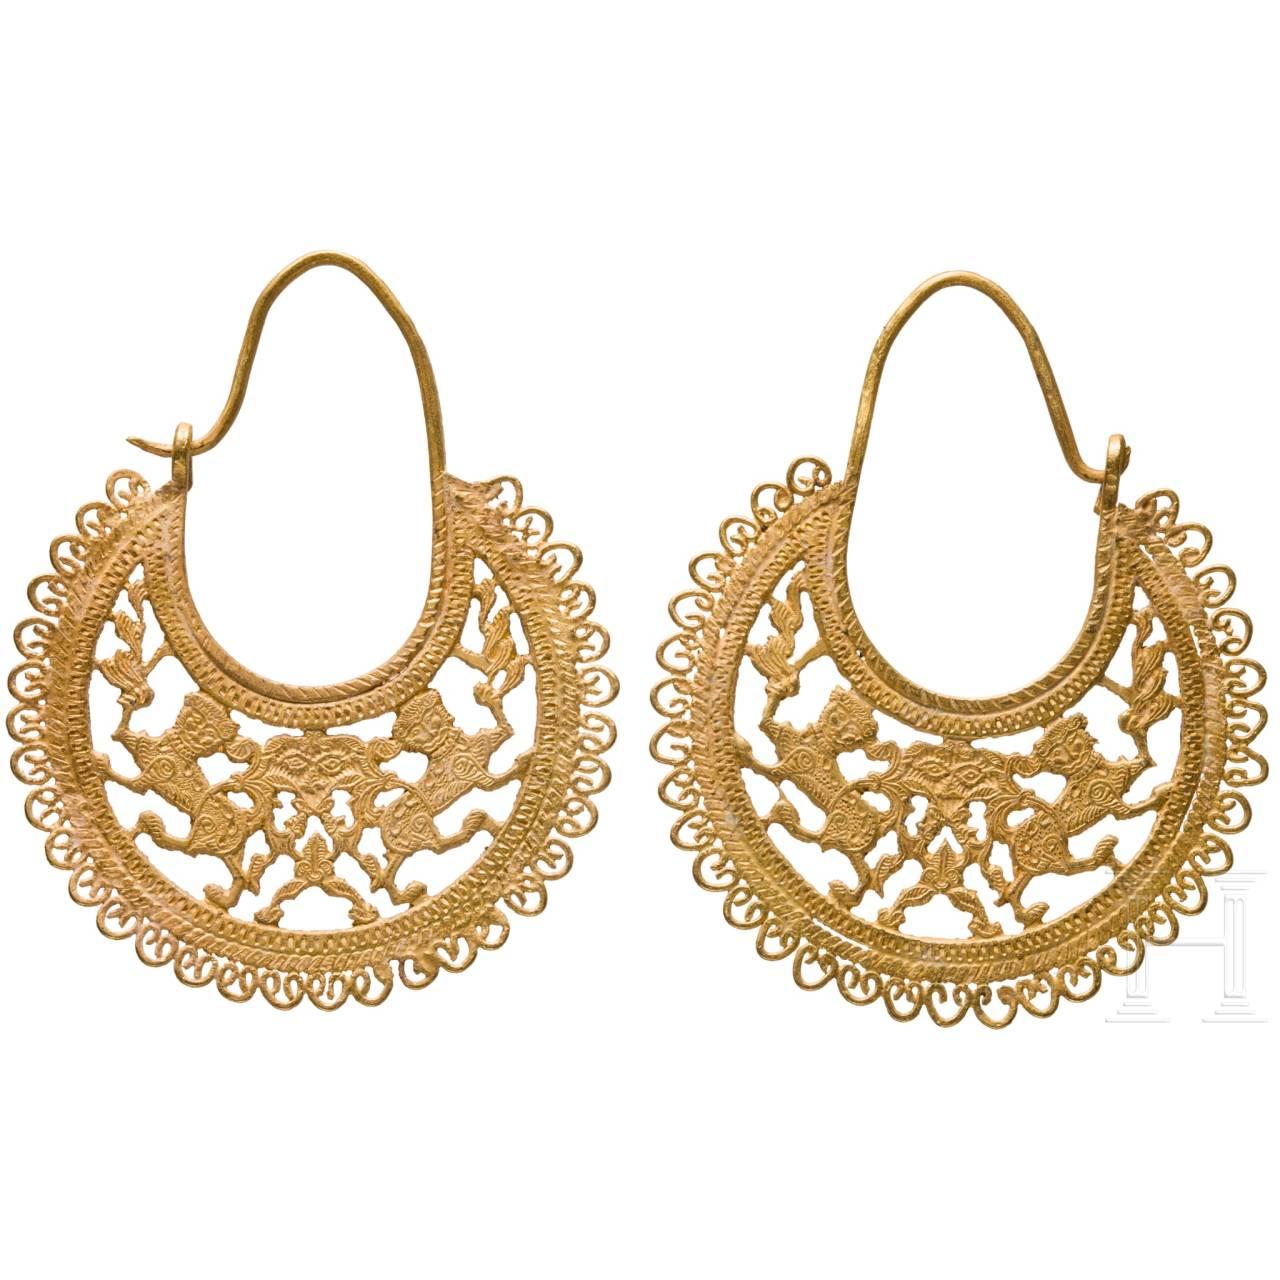 Ein Paar goldene Ohrringe, seldschukisch, 13. Jhdt.